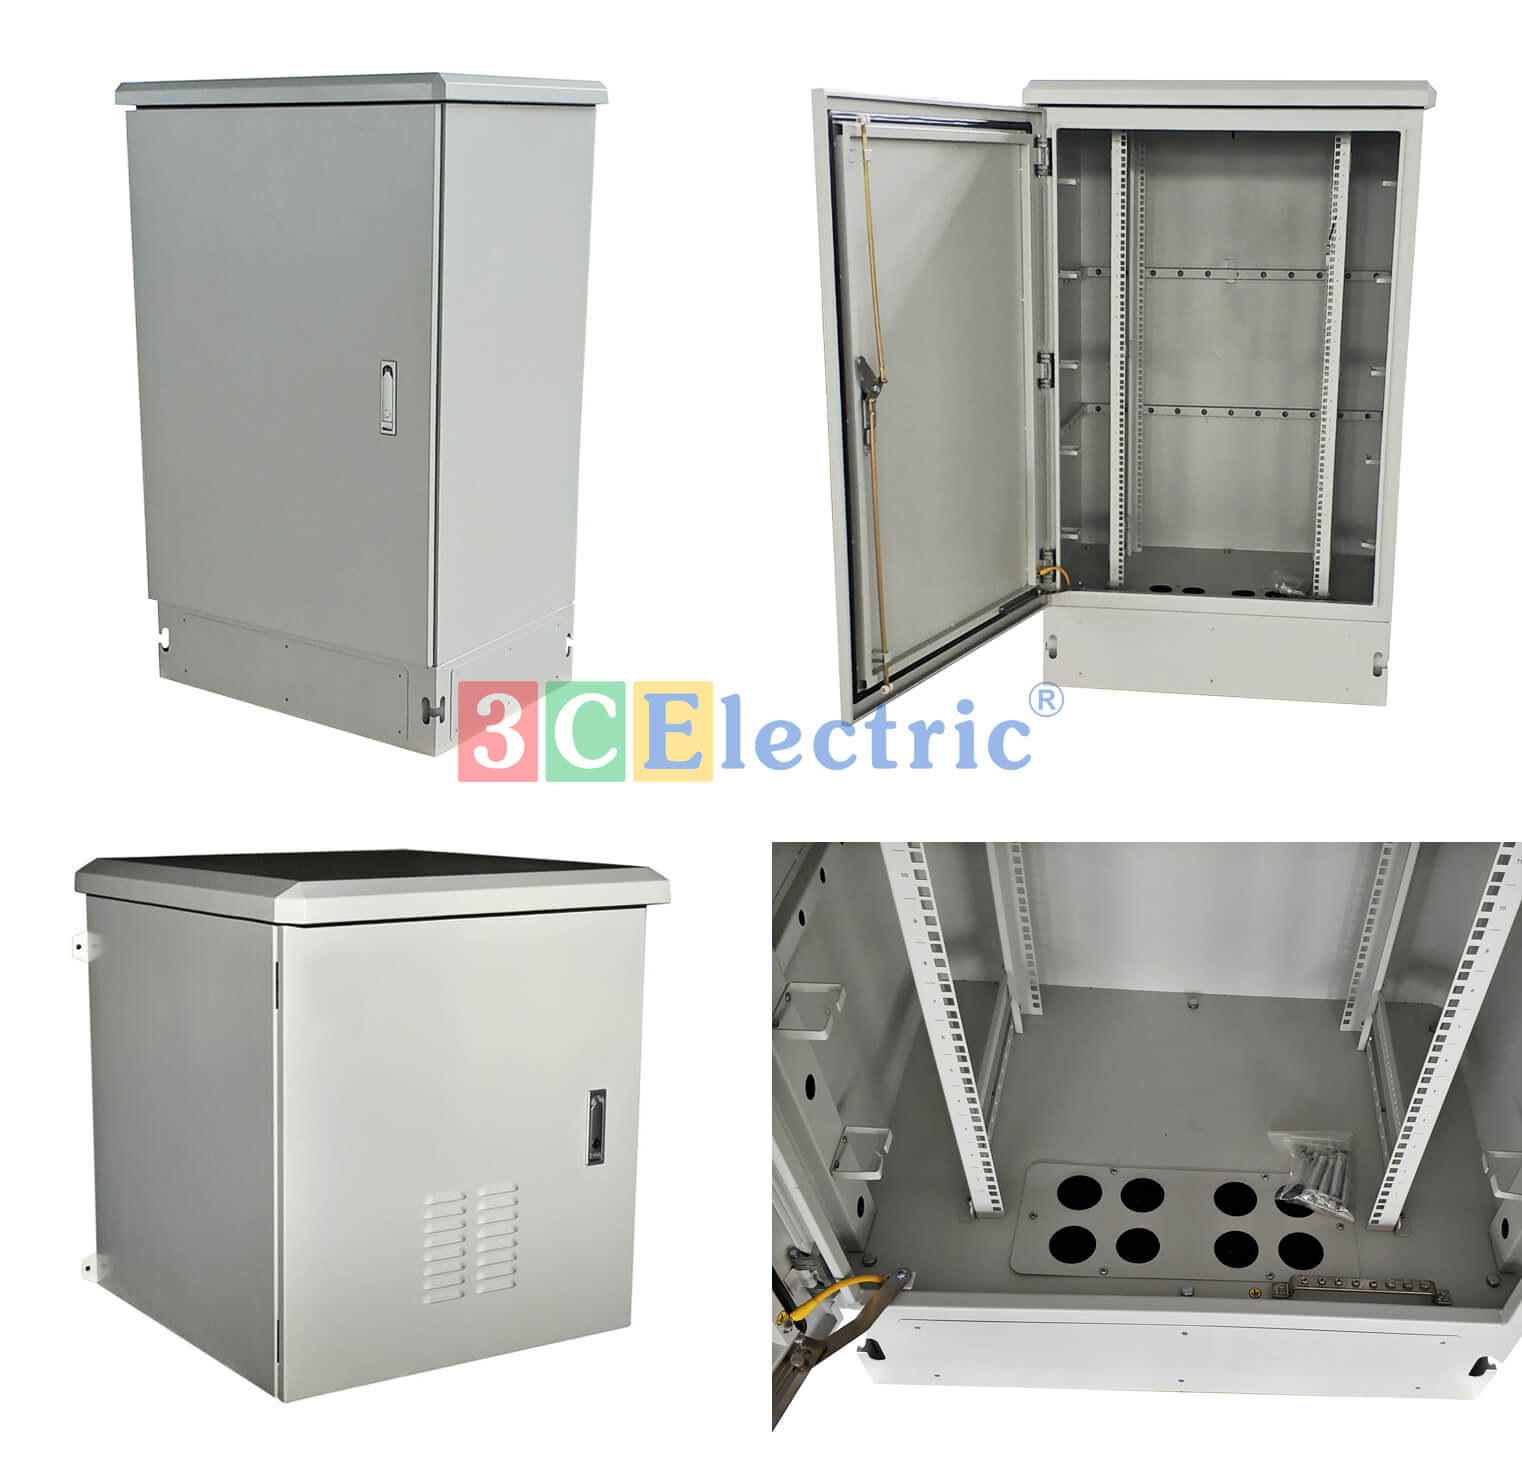 3CElectric sản xuất các loại tủ outdoor Rack